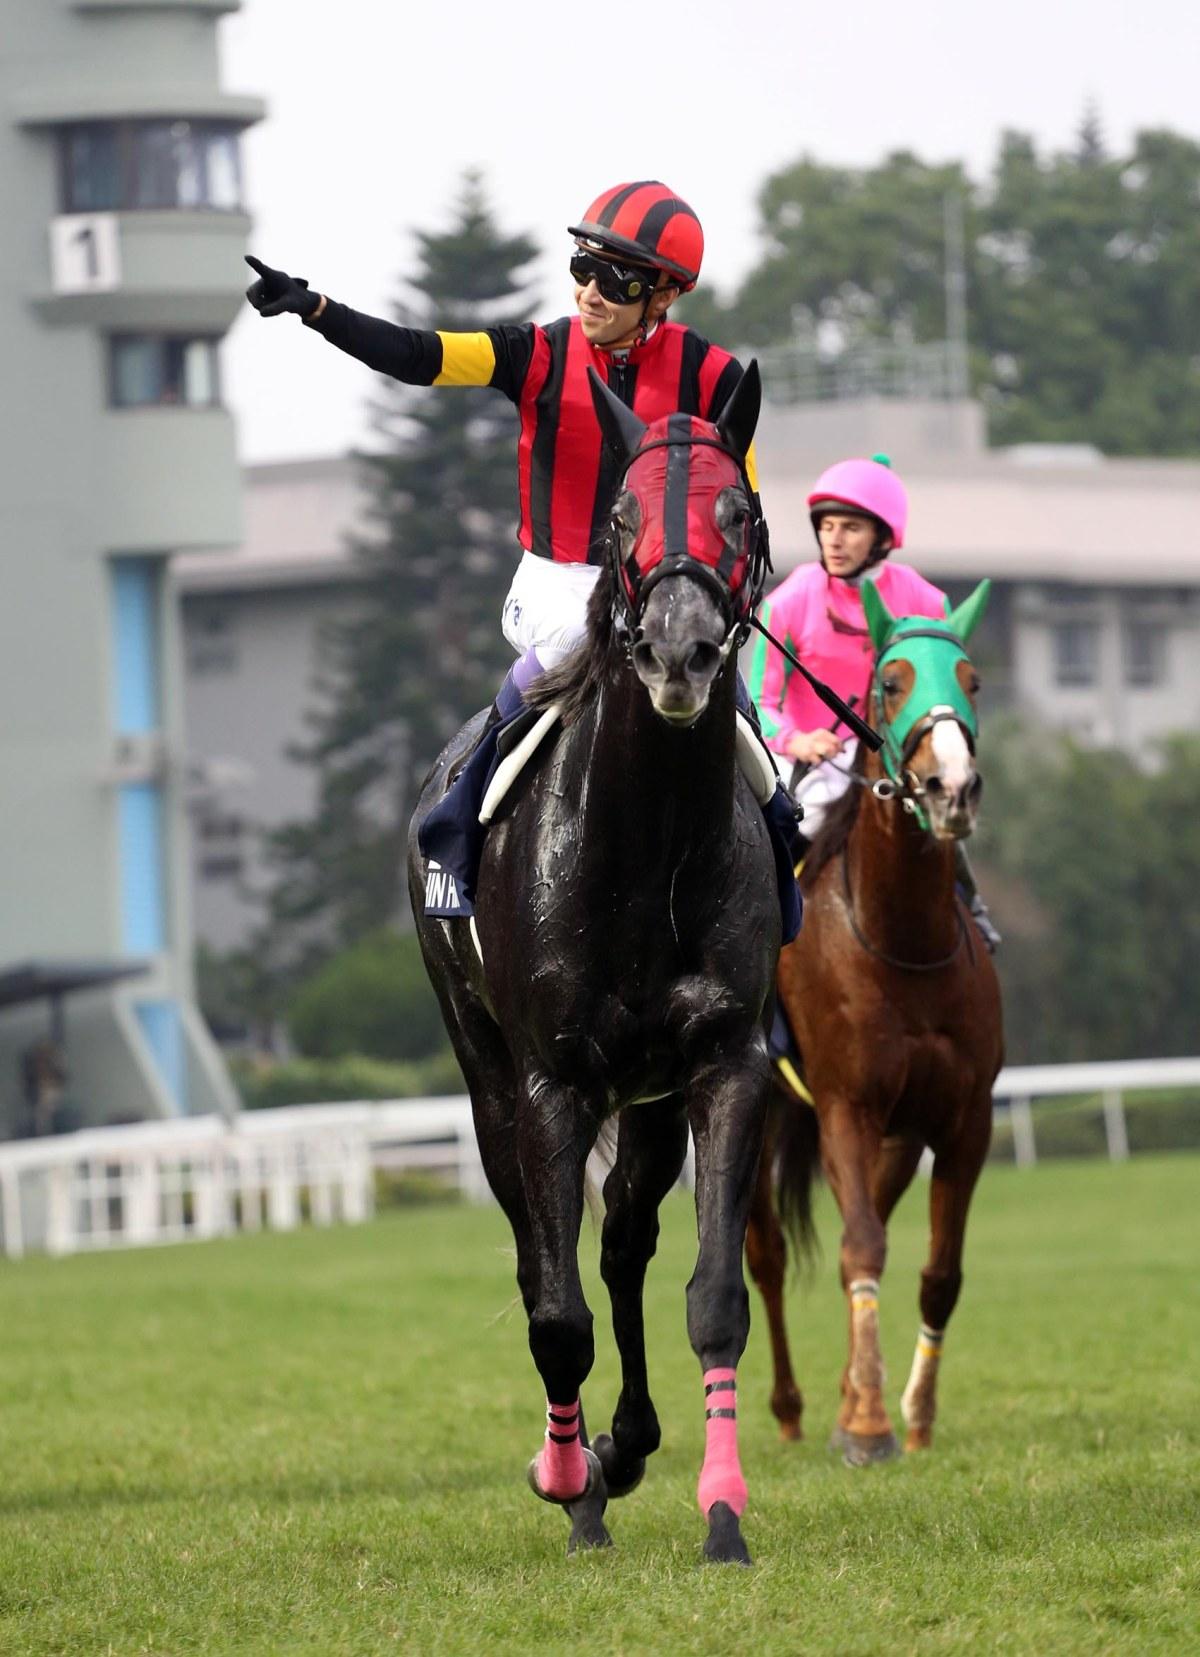 [Flameracing]榮進之光段段有,新幹線香港盃開通(含賽日報導)